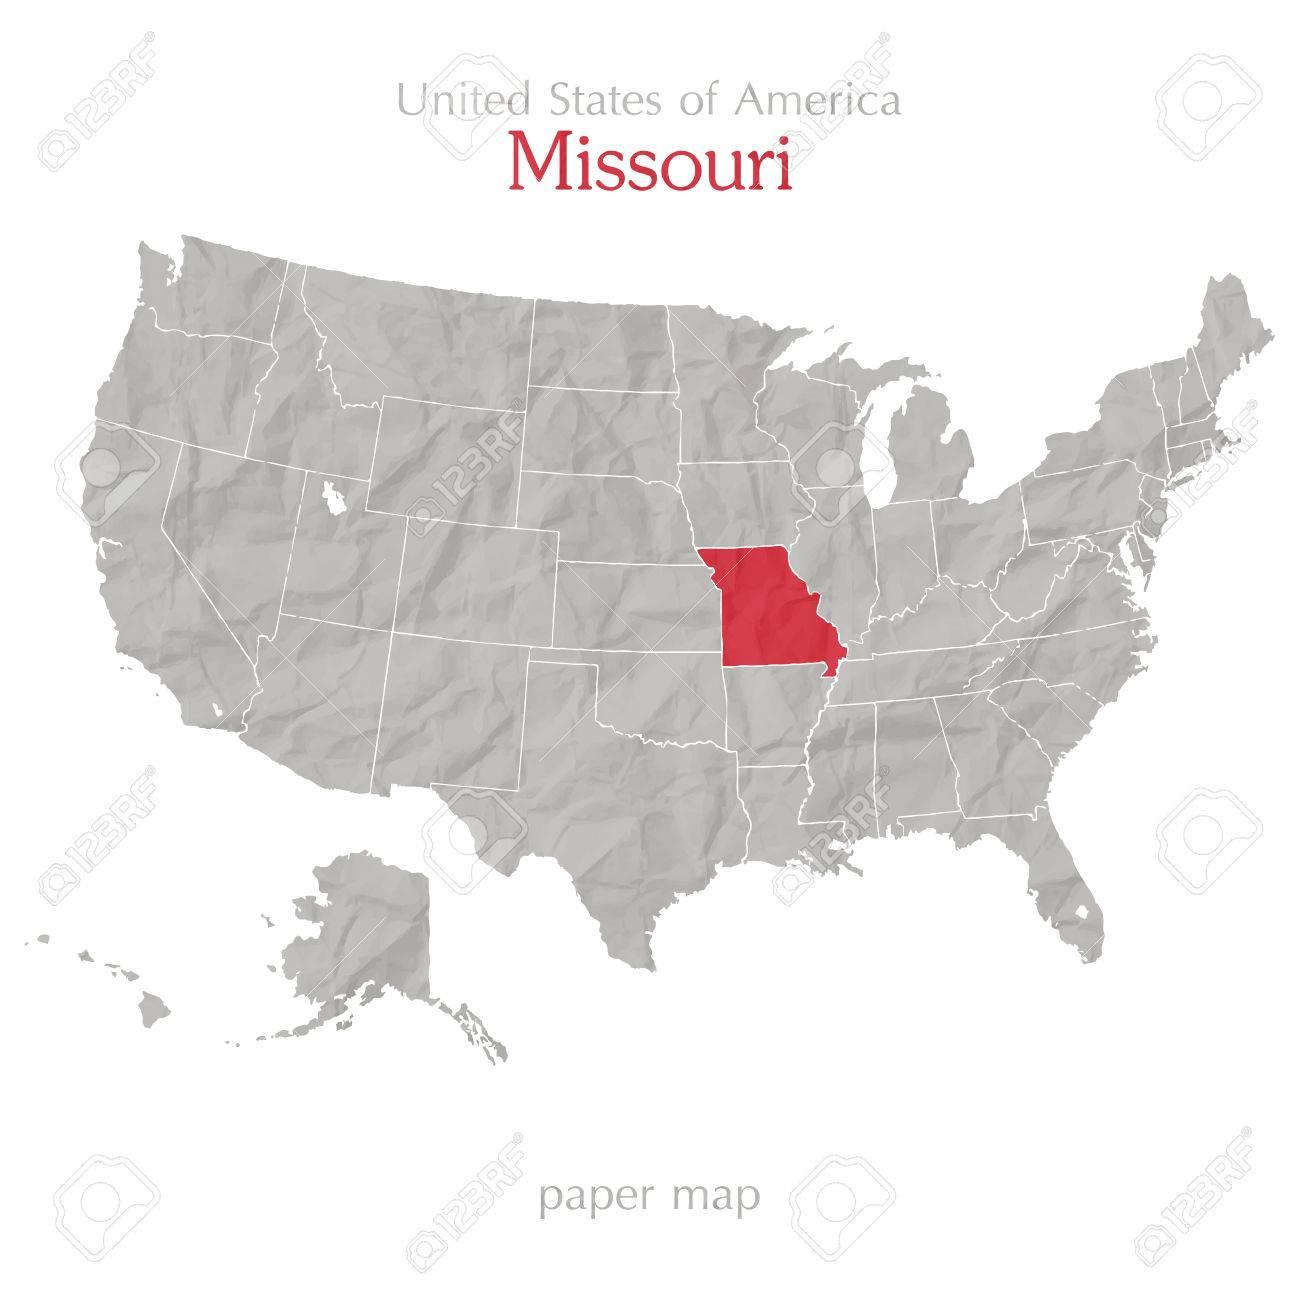 United States Of America Map And Missouri Territory On Paper - United states map of missouri